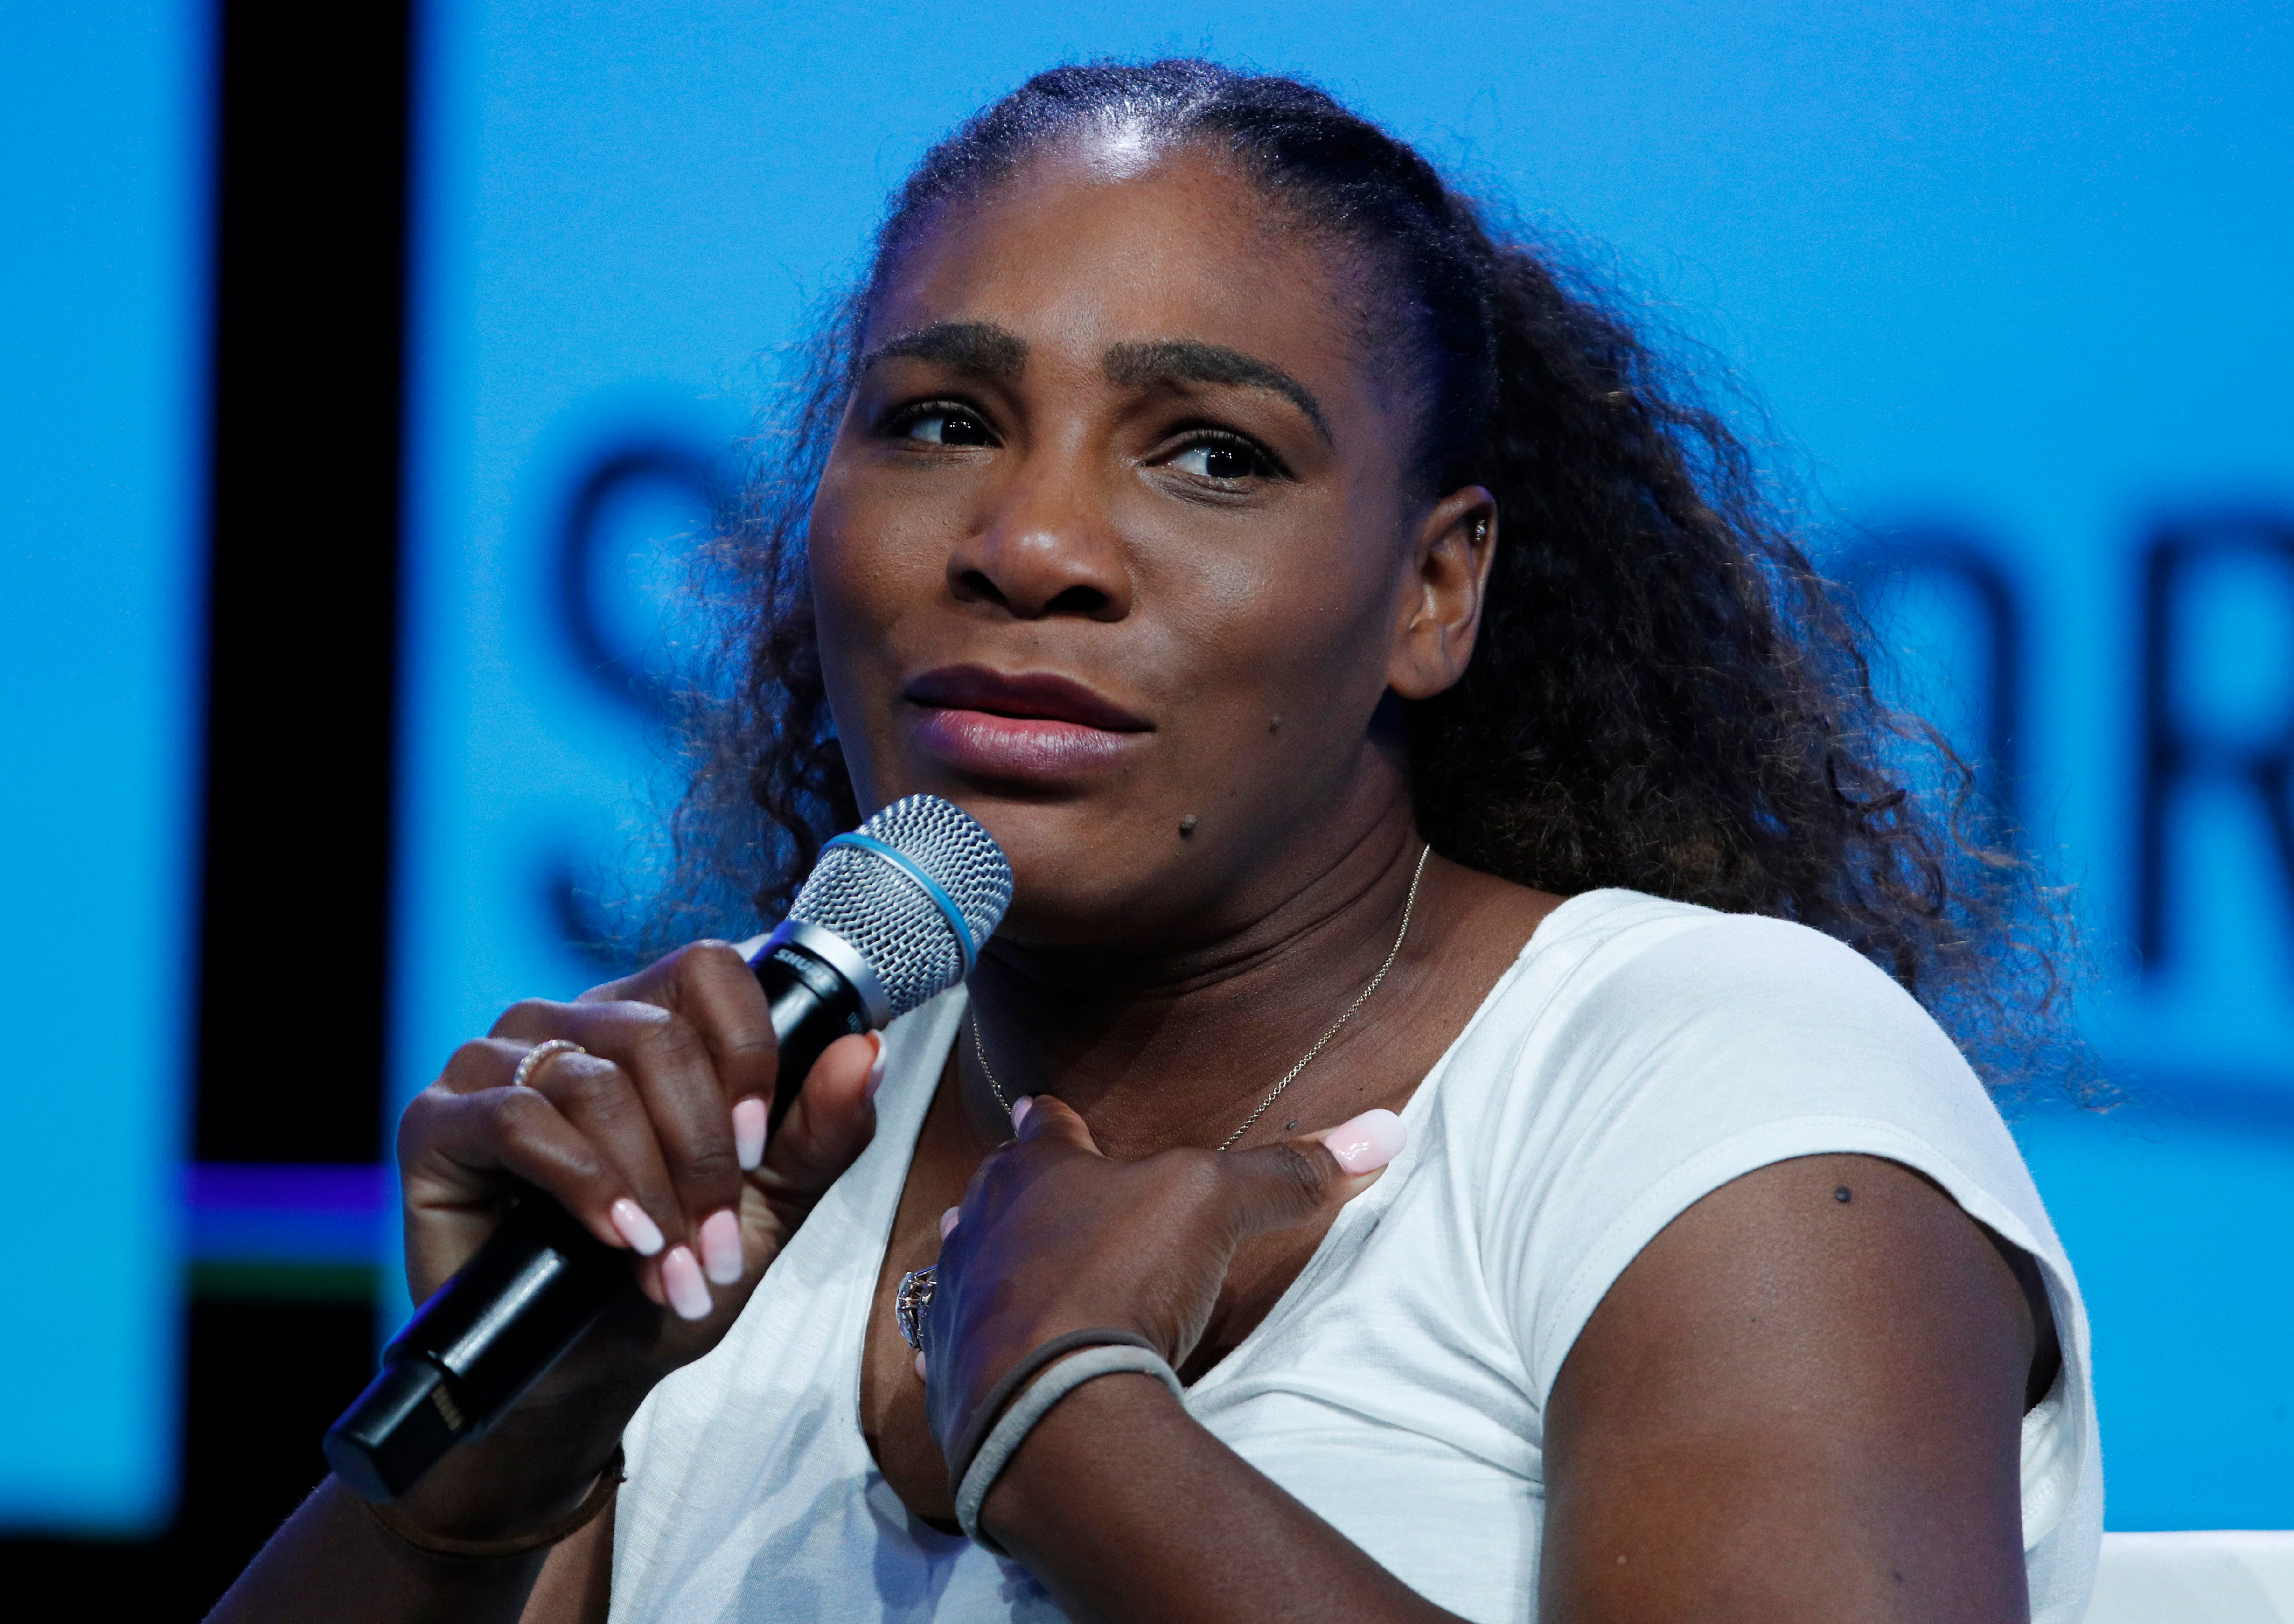 ICloud Serena Williams nudes (86 photo), Tits, Paparazzi, Twitter, braless 2020